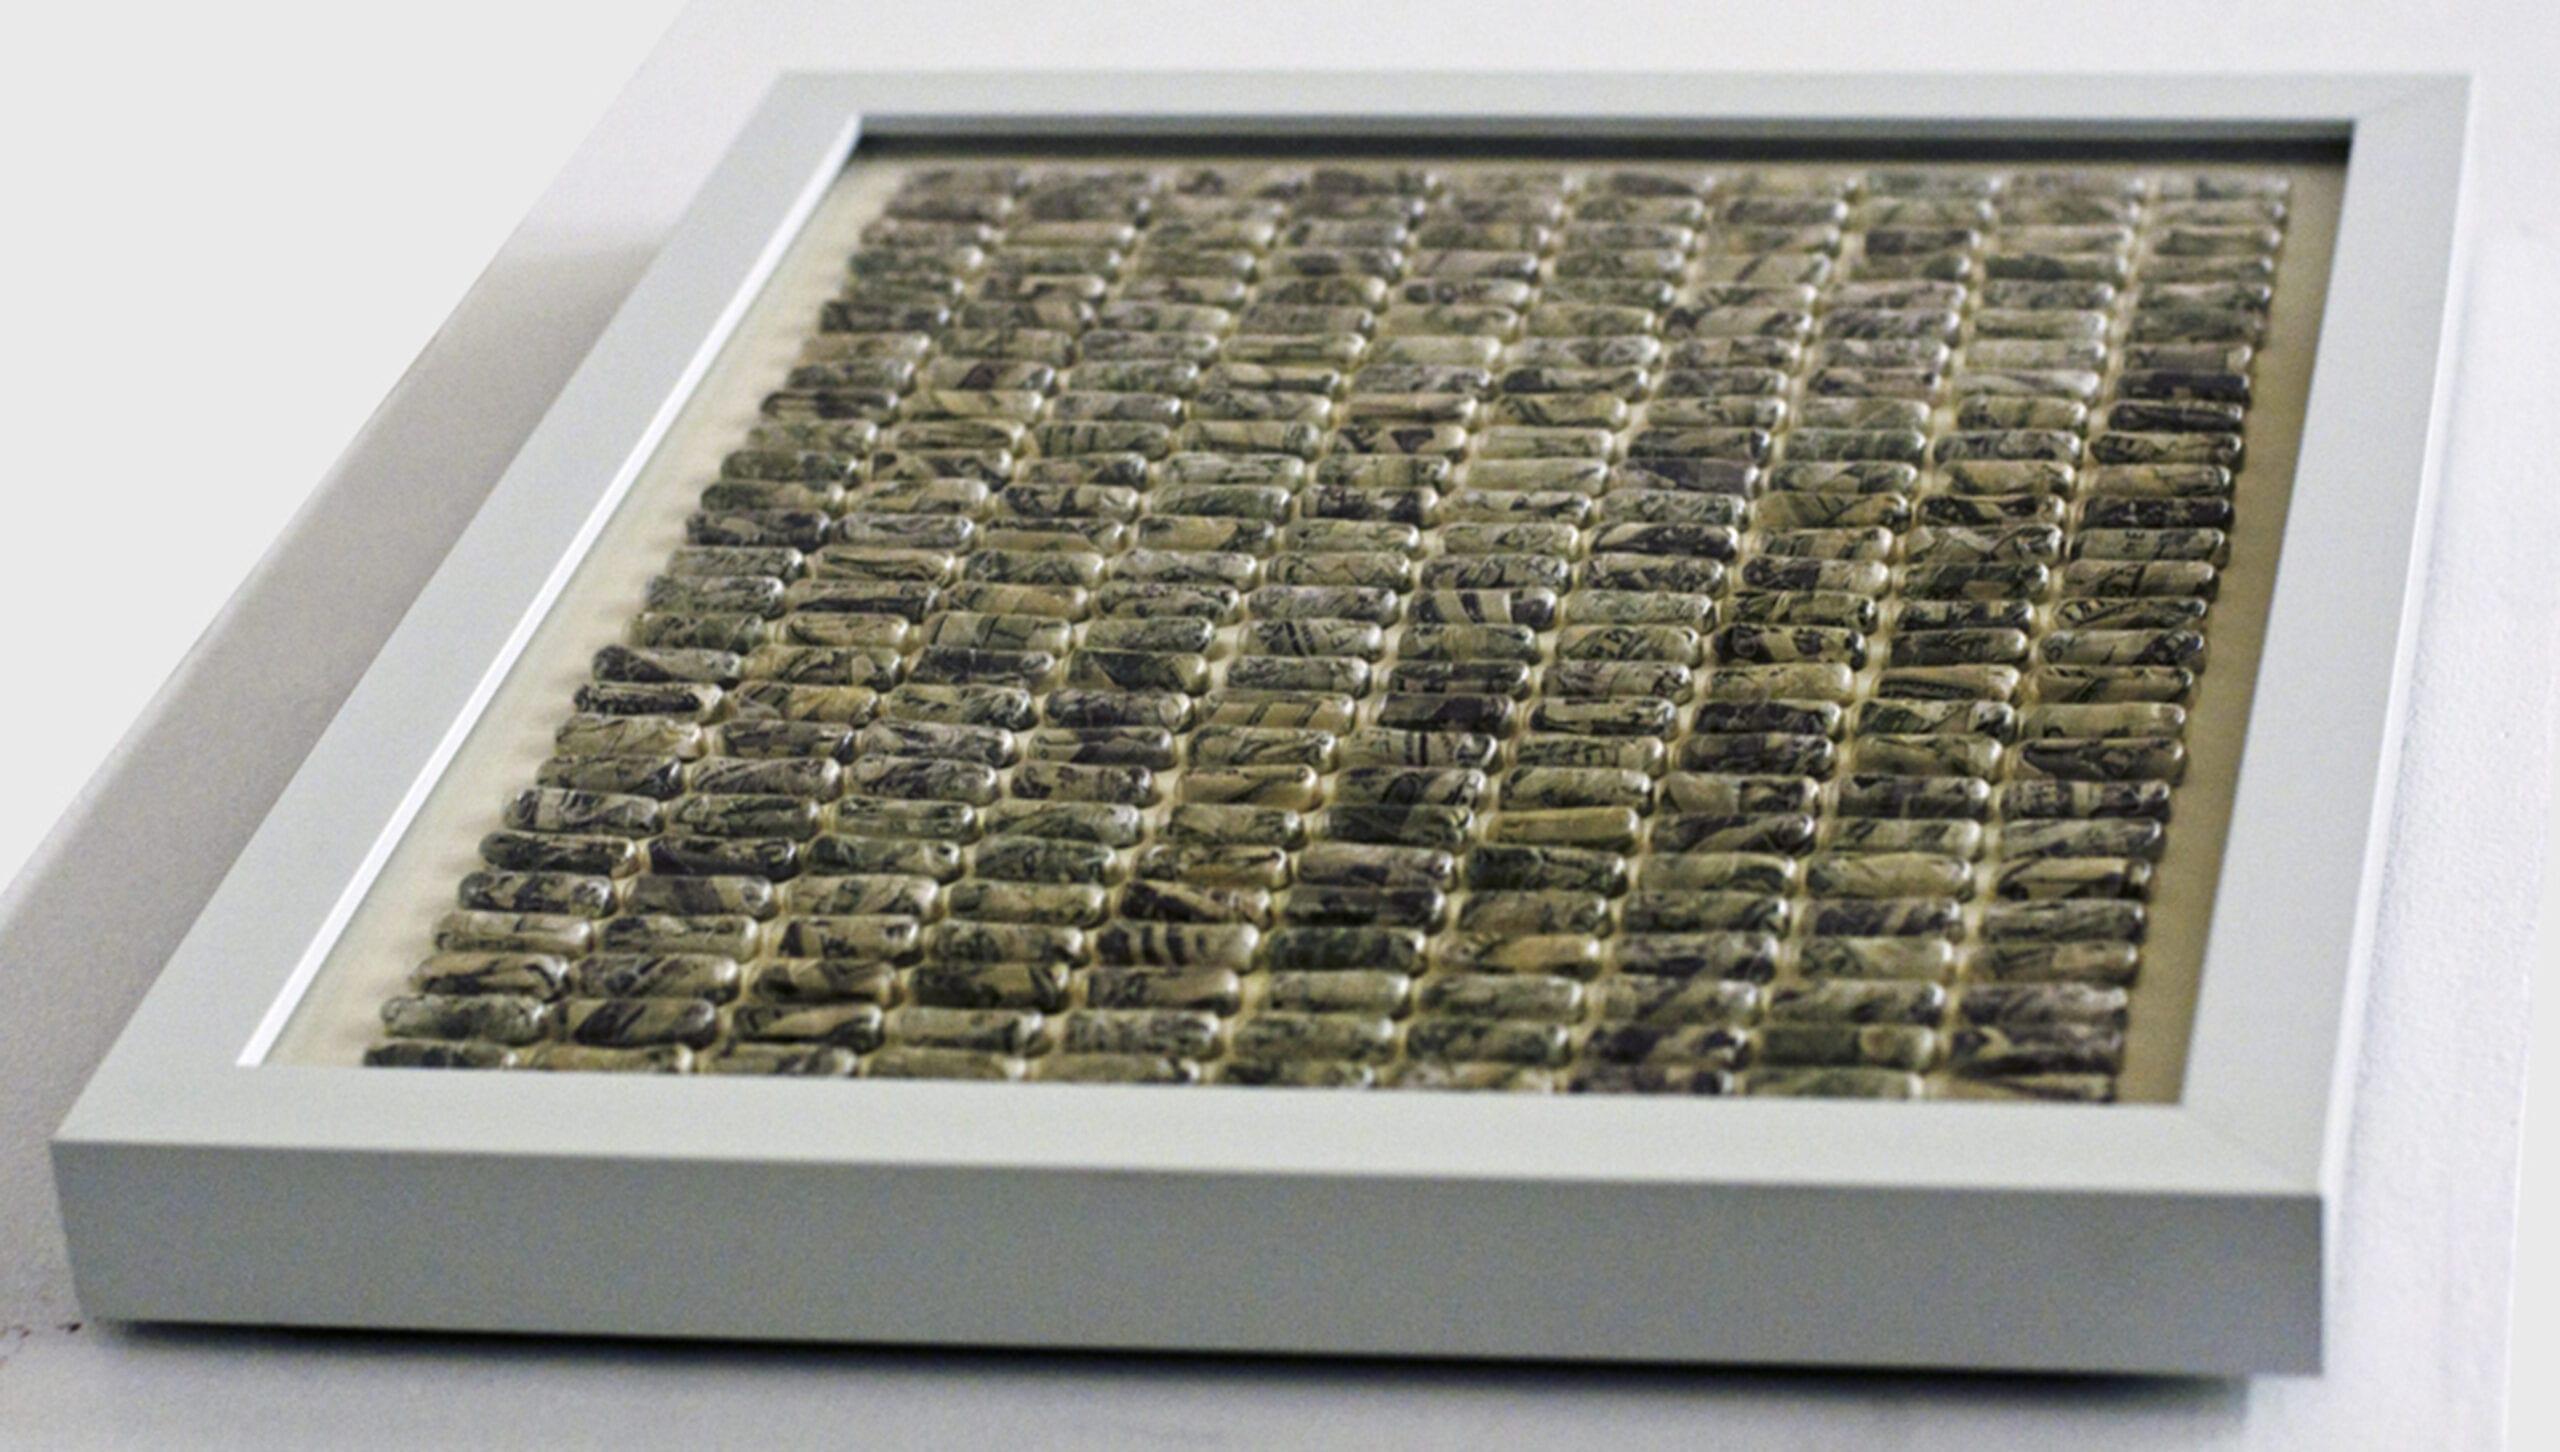 Jason Guo, One-Year American, Empty gelatin 00 capsules, 100-dollar bills, MDF, steel, acrylic, UV glass, 30 x 30 x 3 cm, 2011